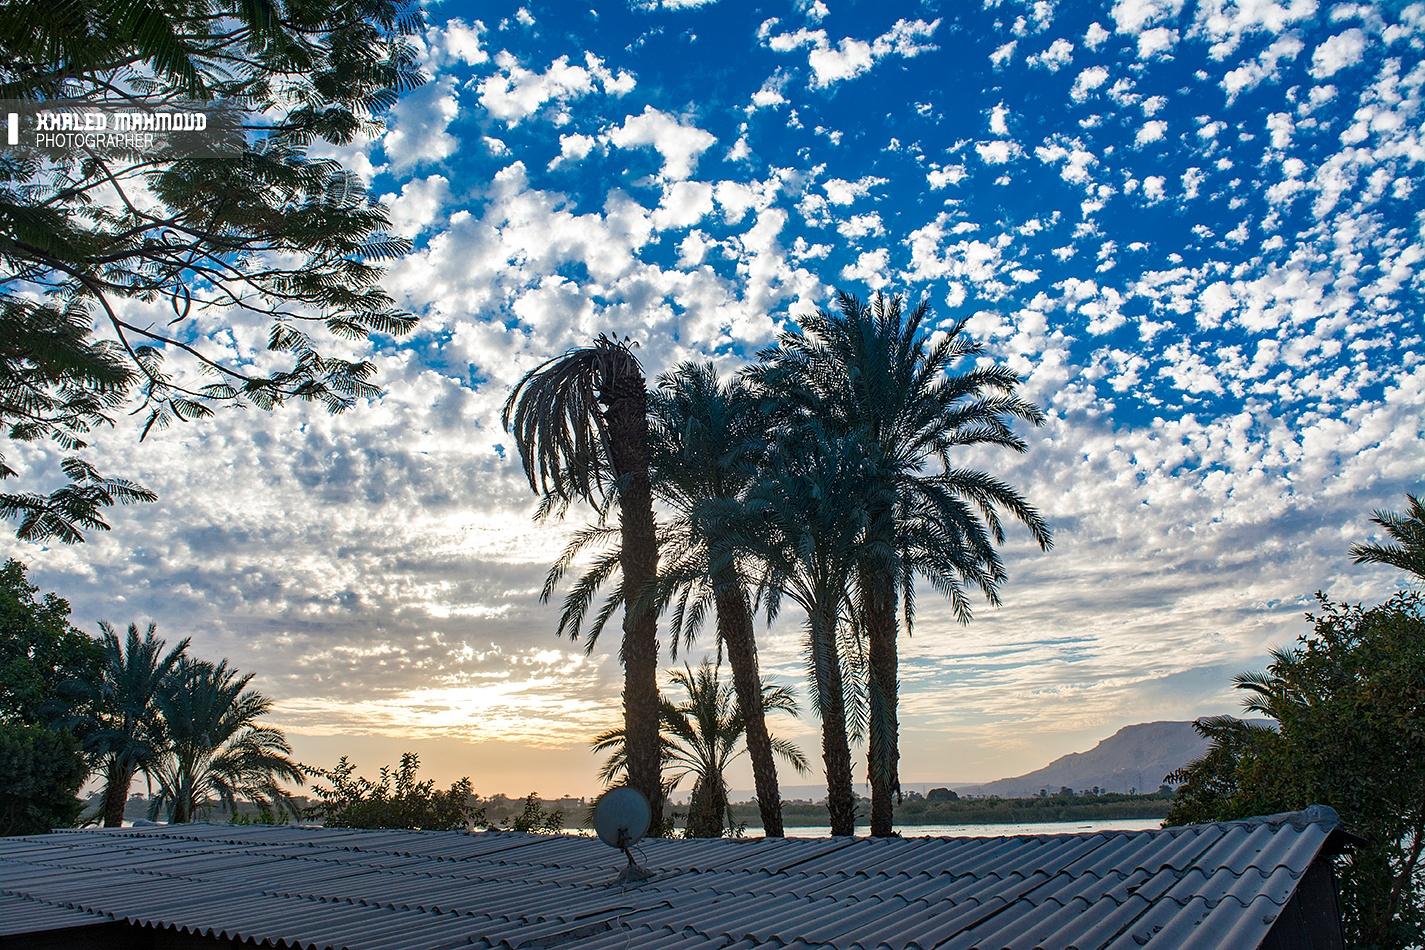 sunset by khaledmahmoud